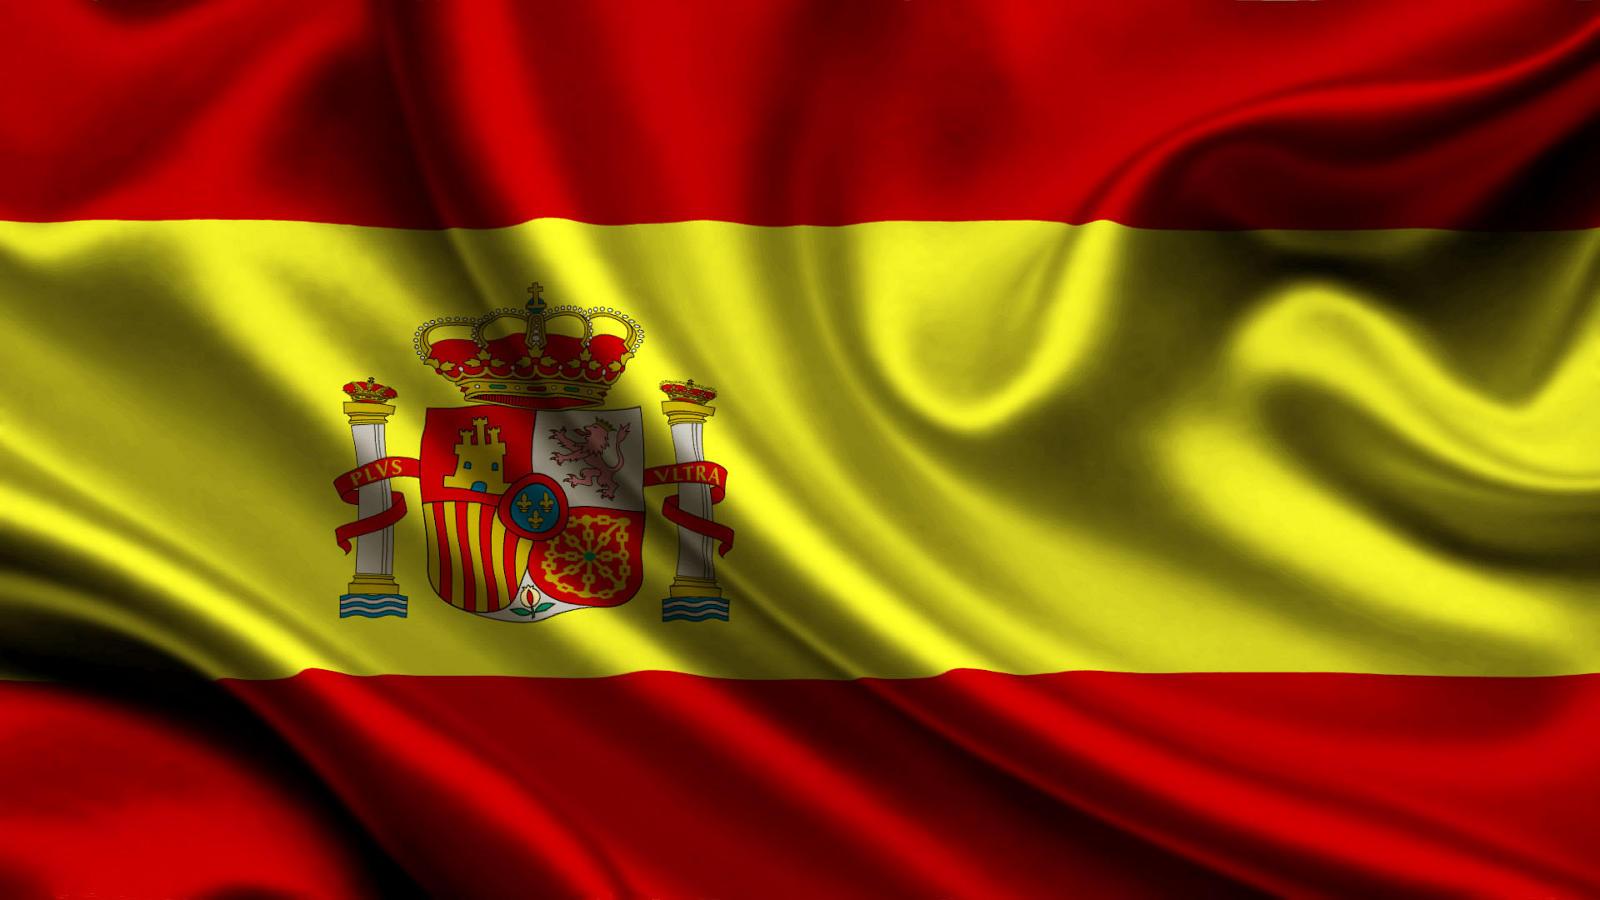 bandera-espanola